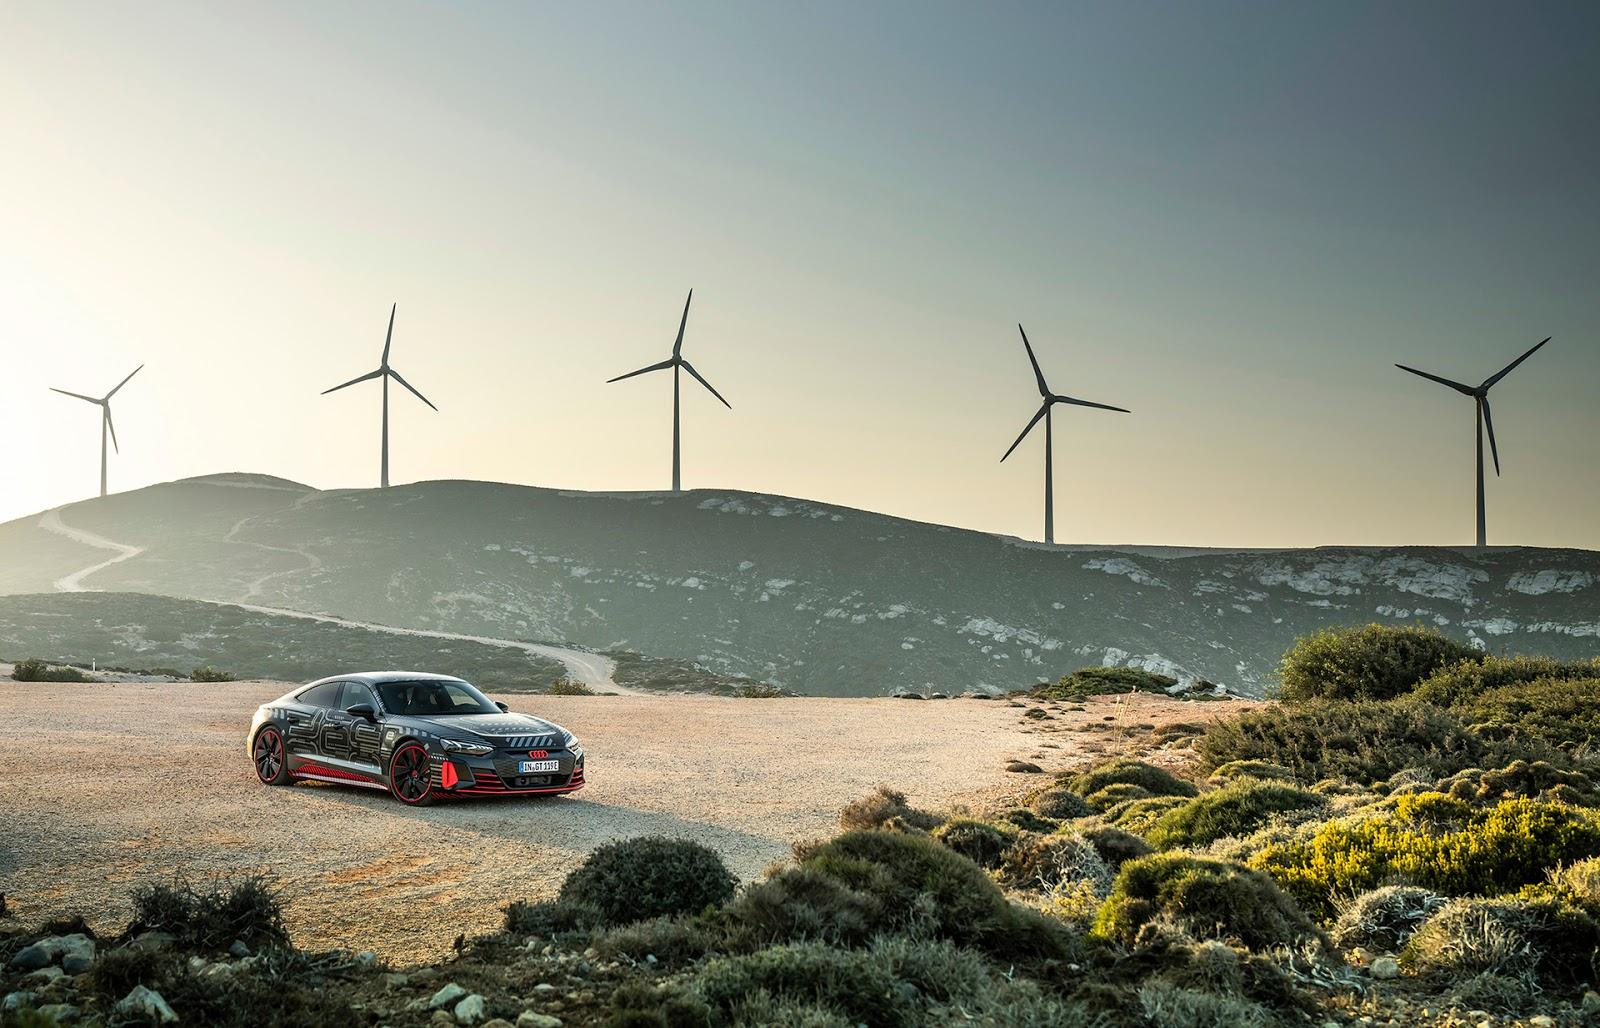 AUDI2B 2B25CE259525CE259D25CE259125CE25A125CE259E25CE25972B25CE25A025CE259125CE25A125CE259125CE259325CE25A925CE259325CE259725CE25A32B25CE25A425CE259F25CE25A52BE TRON2BGT 2 1 Audi : Ξεκινάει η παραγωγή του e-tron GT Audi, Audi E-tron, E-tron, E-Tron GT, Electric cars, electric vehicles, EV, ειδήσεις, ηλεκτρικά, ηλεκτροκινηση